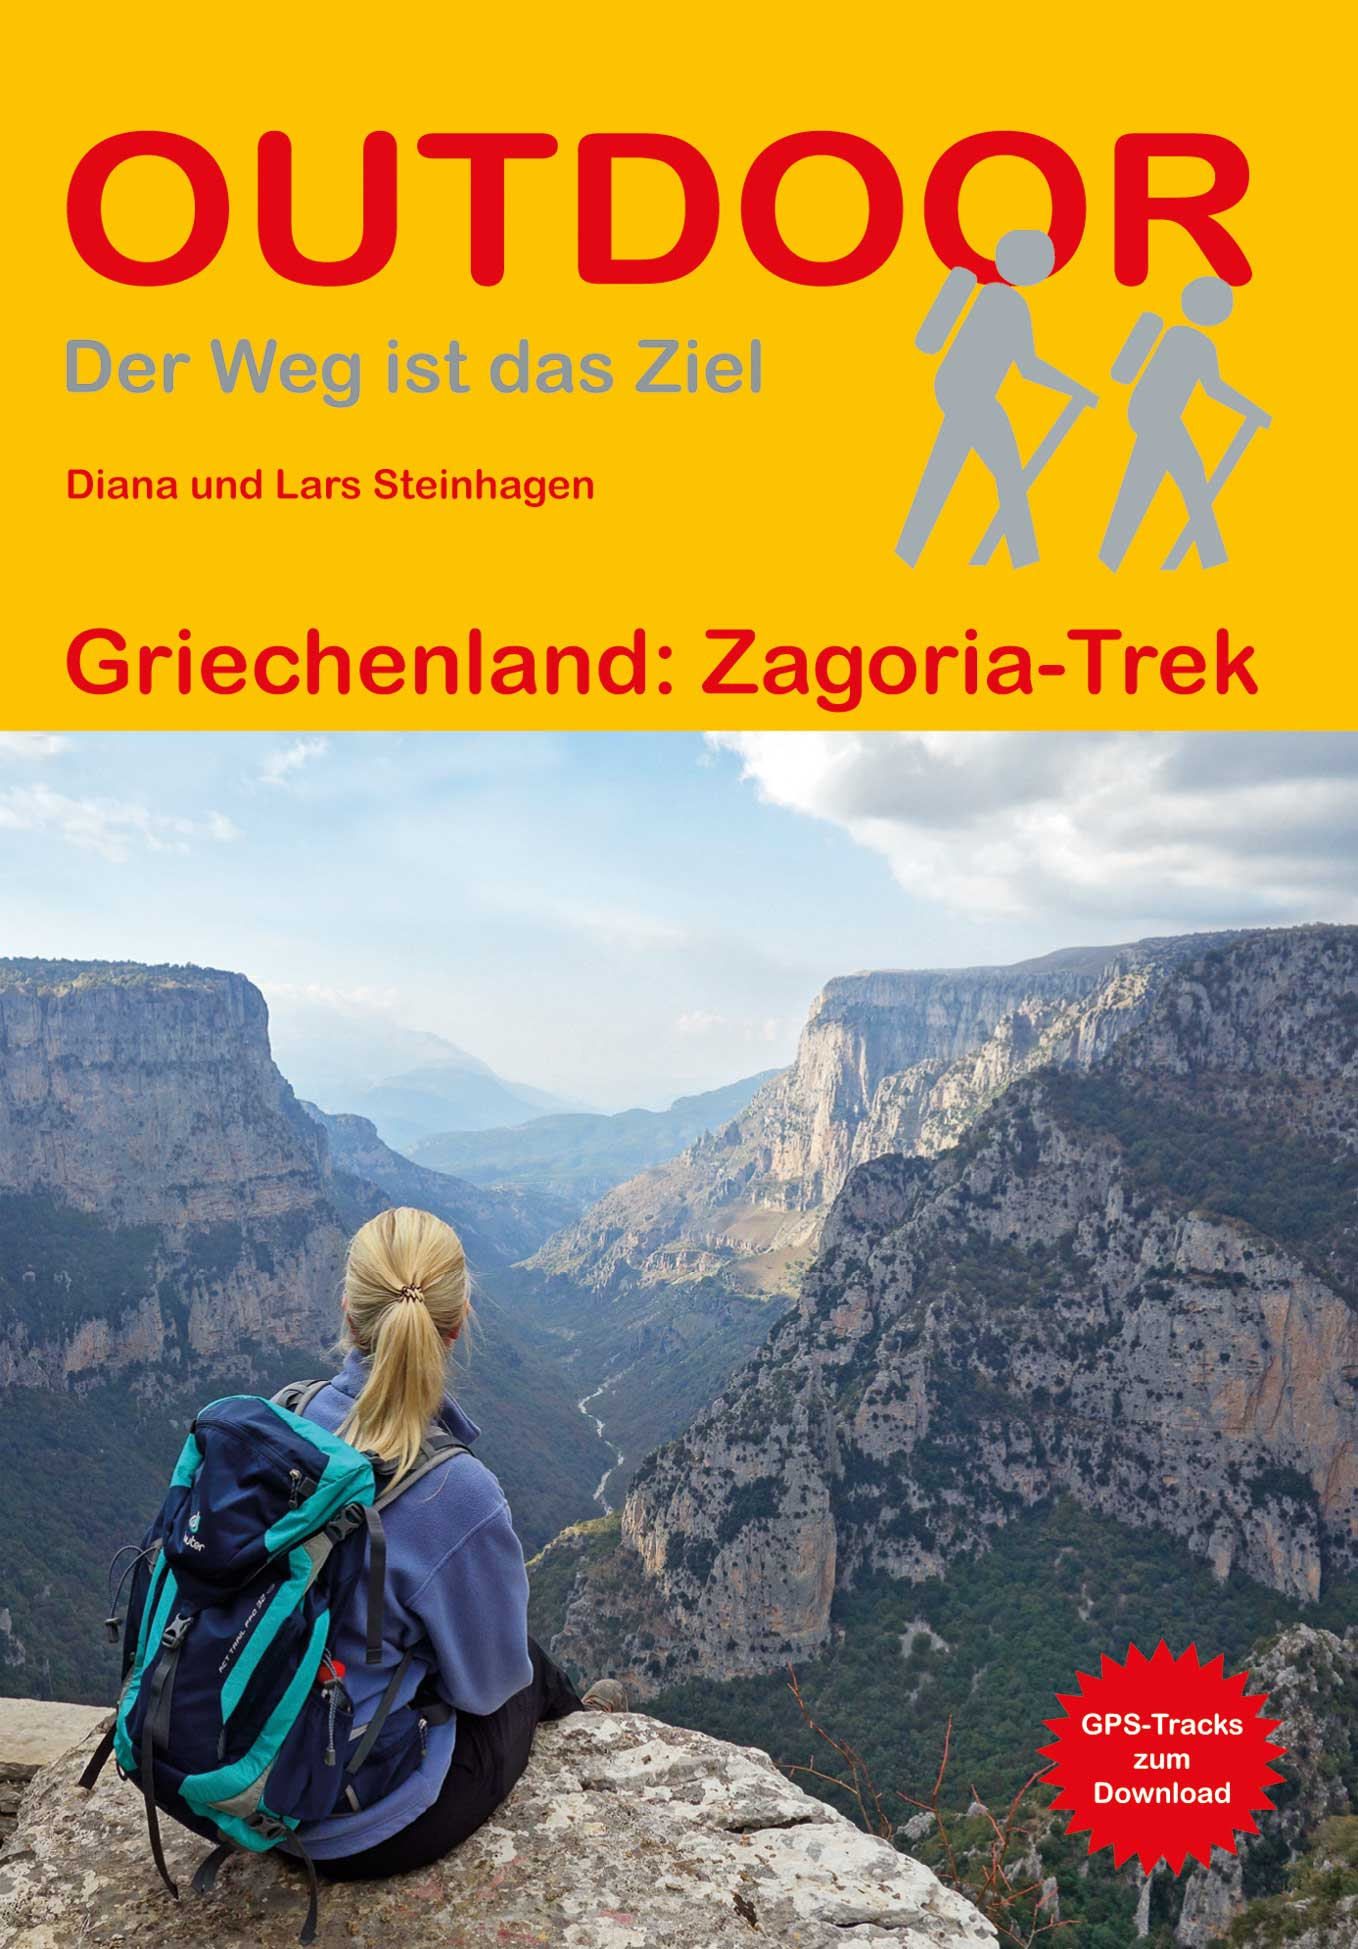 Griechenland: Zagoria-Trek